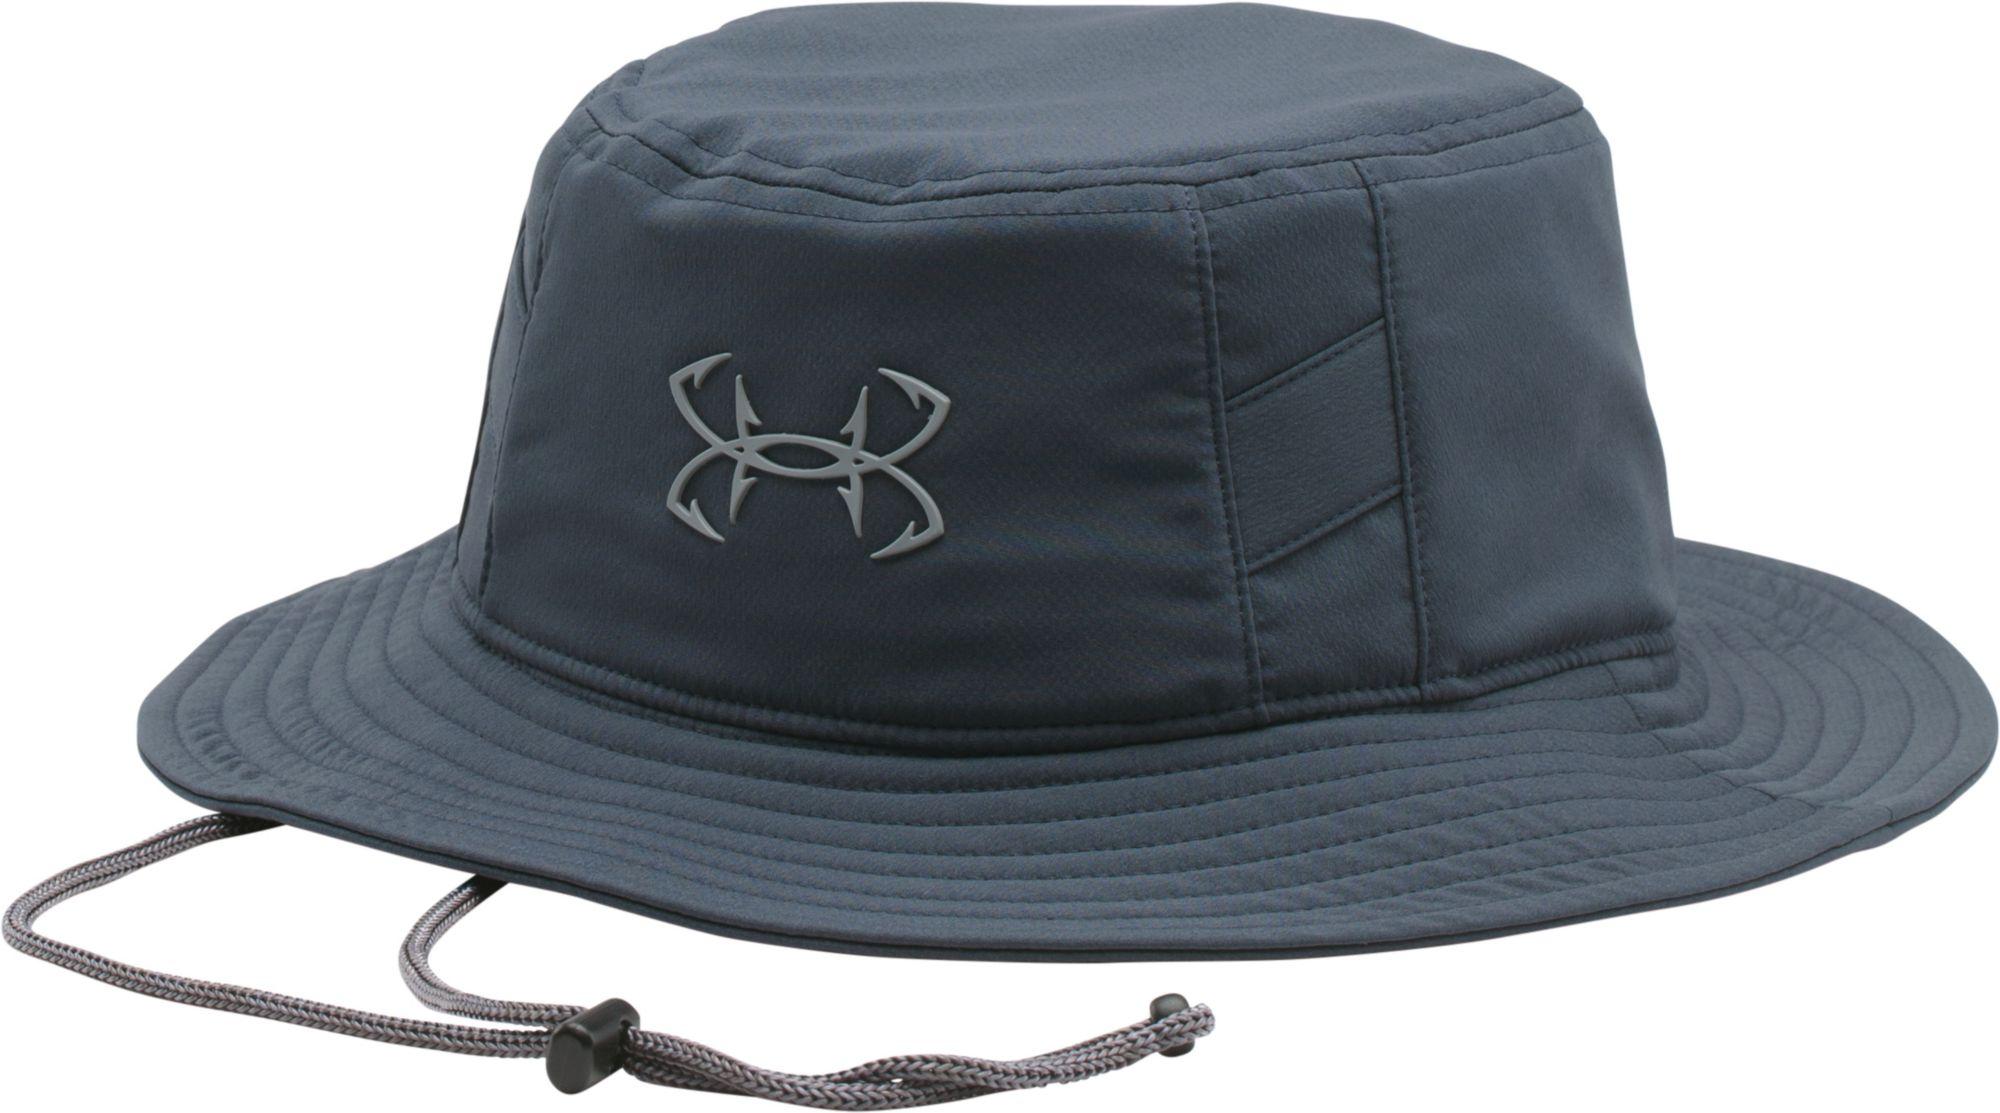 Tren topi bucket hat indonesia for Under armour fish hook hat